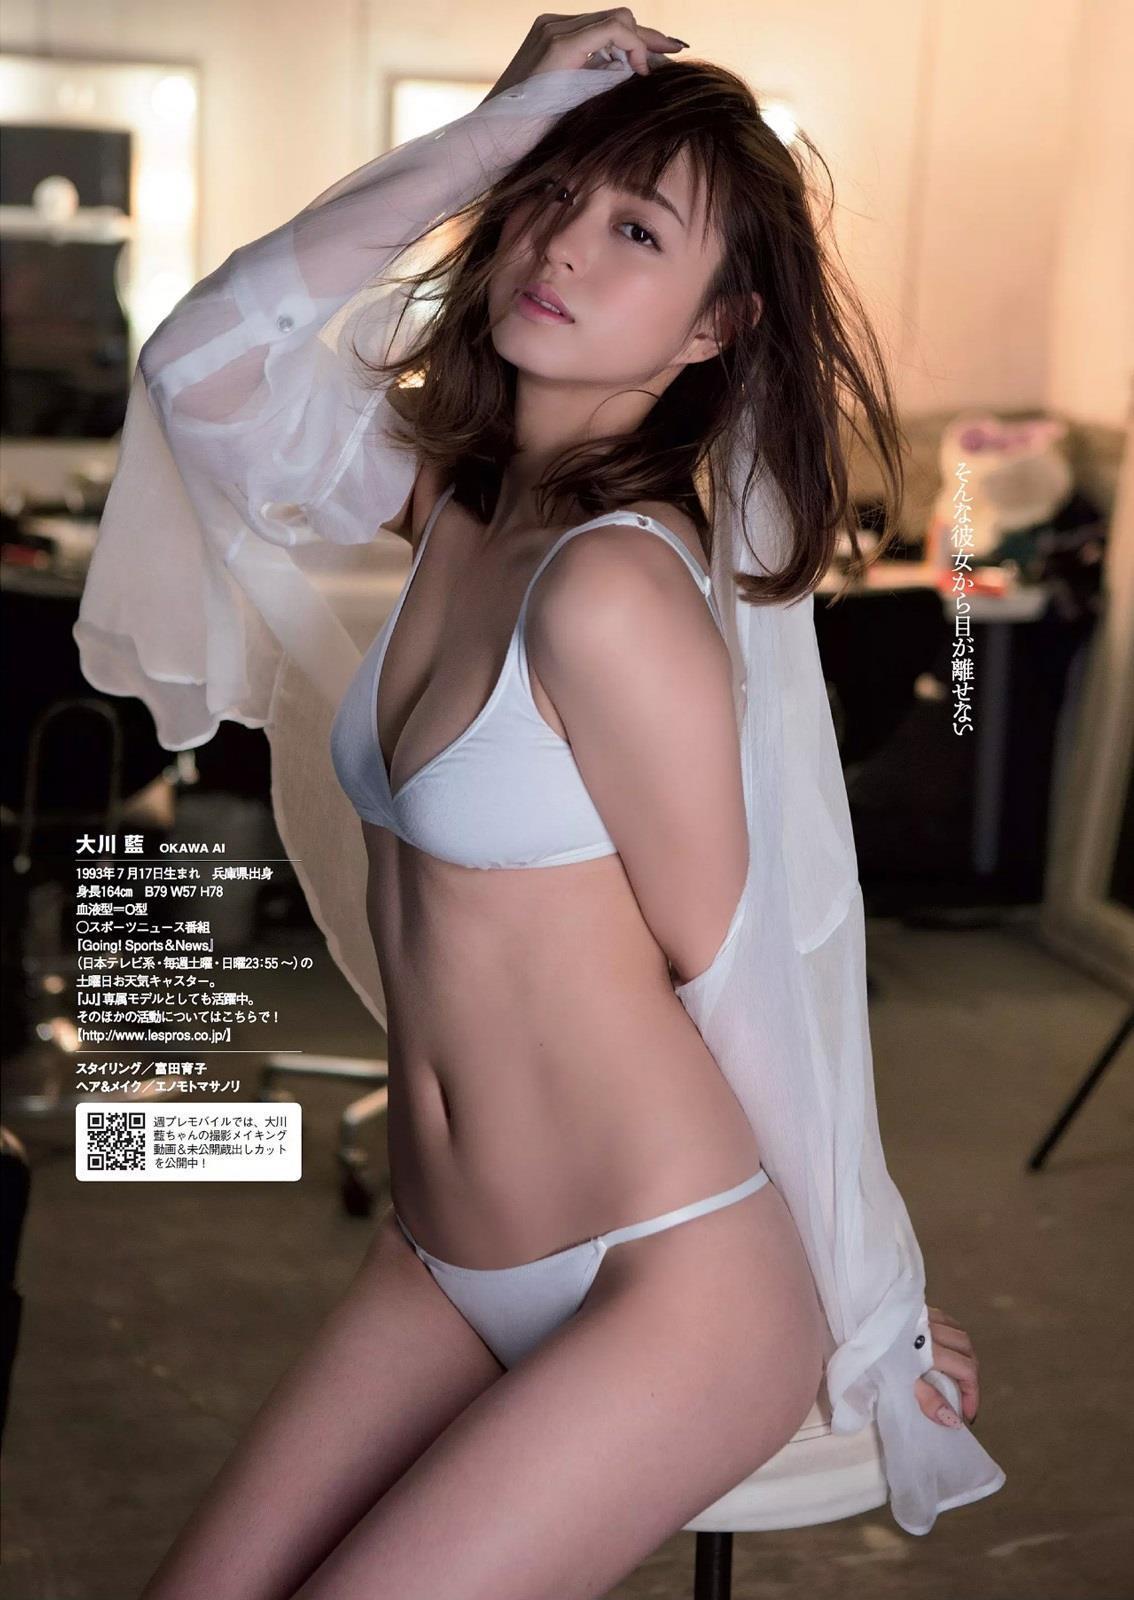 ookawa_ai196.jpg